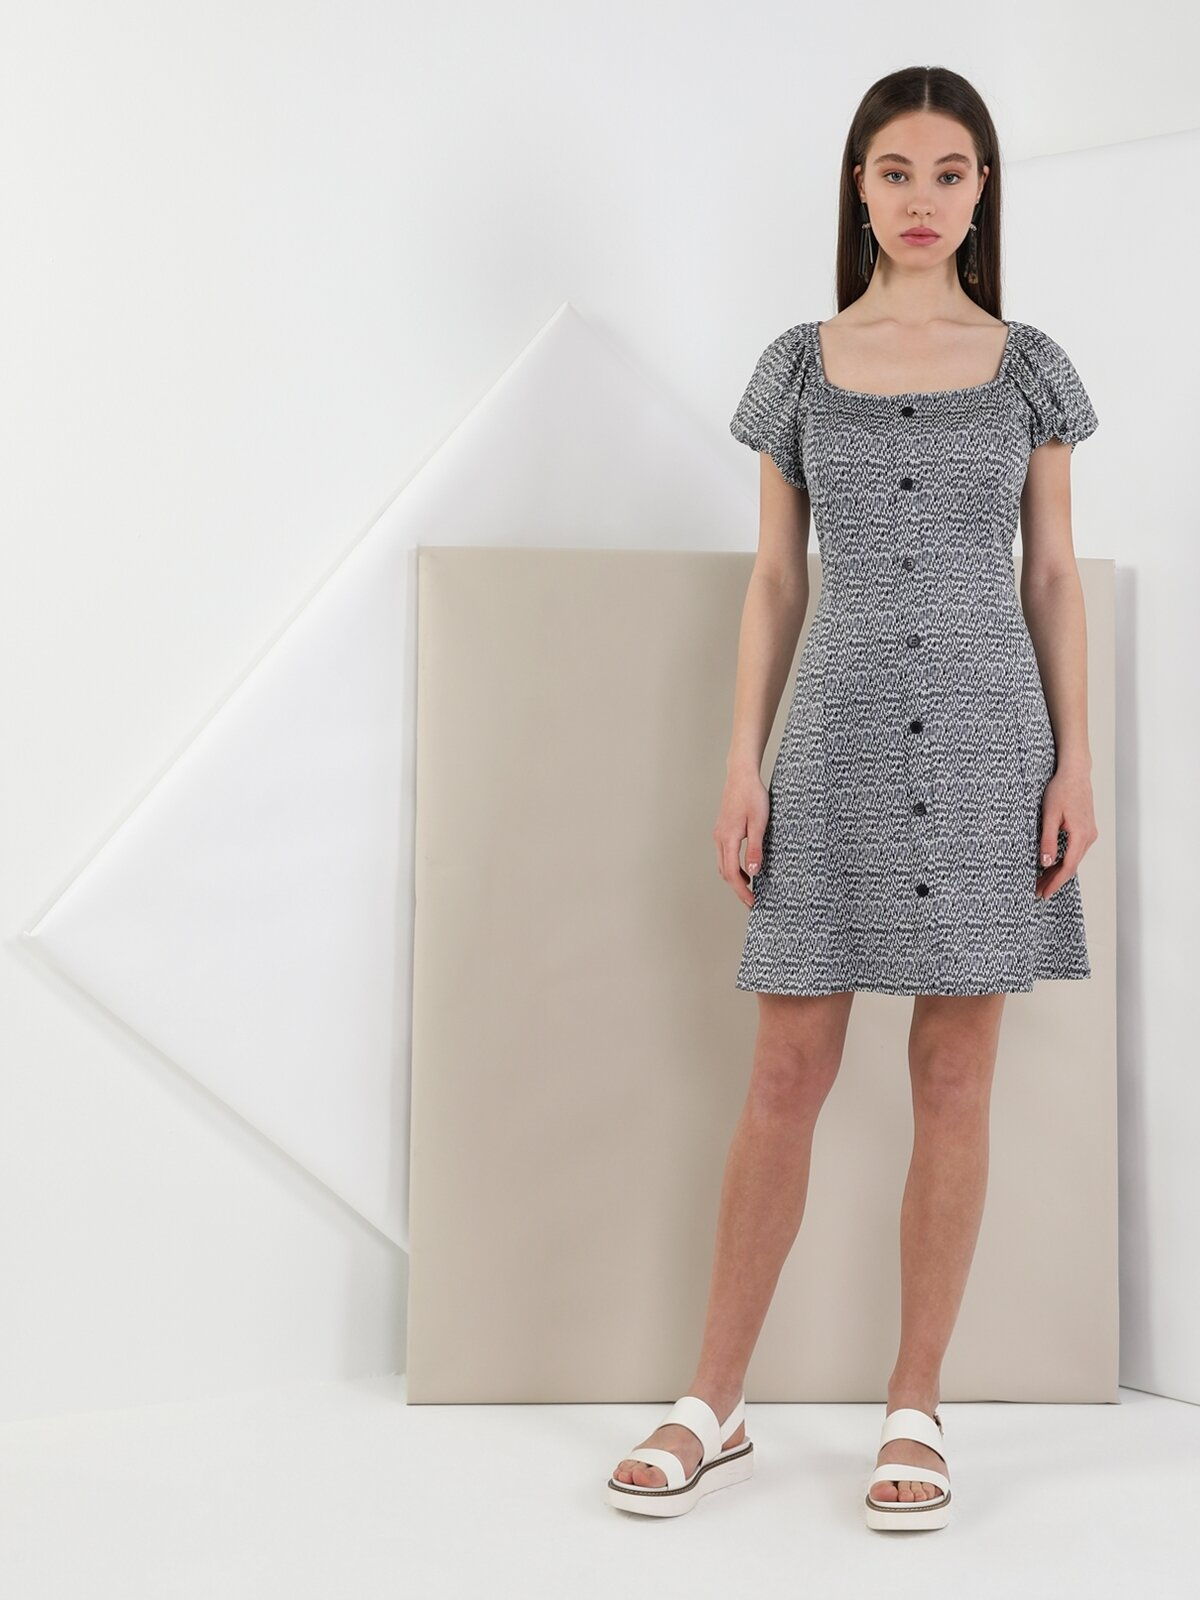 Regular Fit Standart Kolsiyah Kadın Elbise